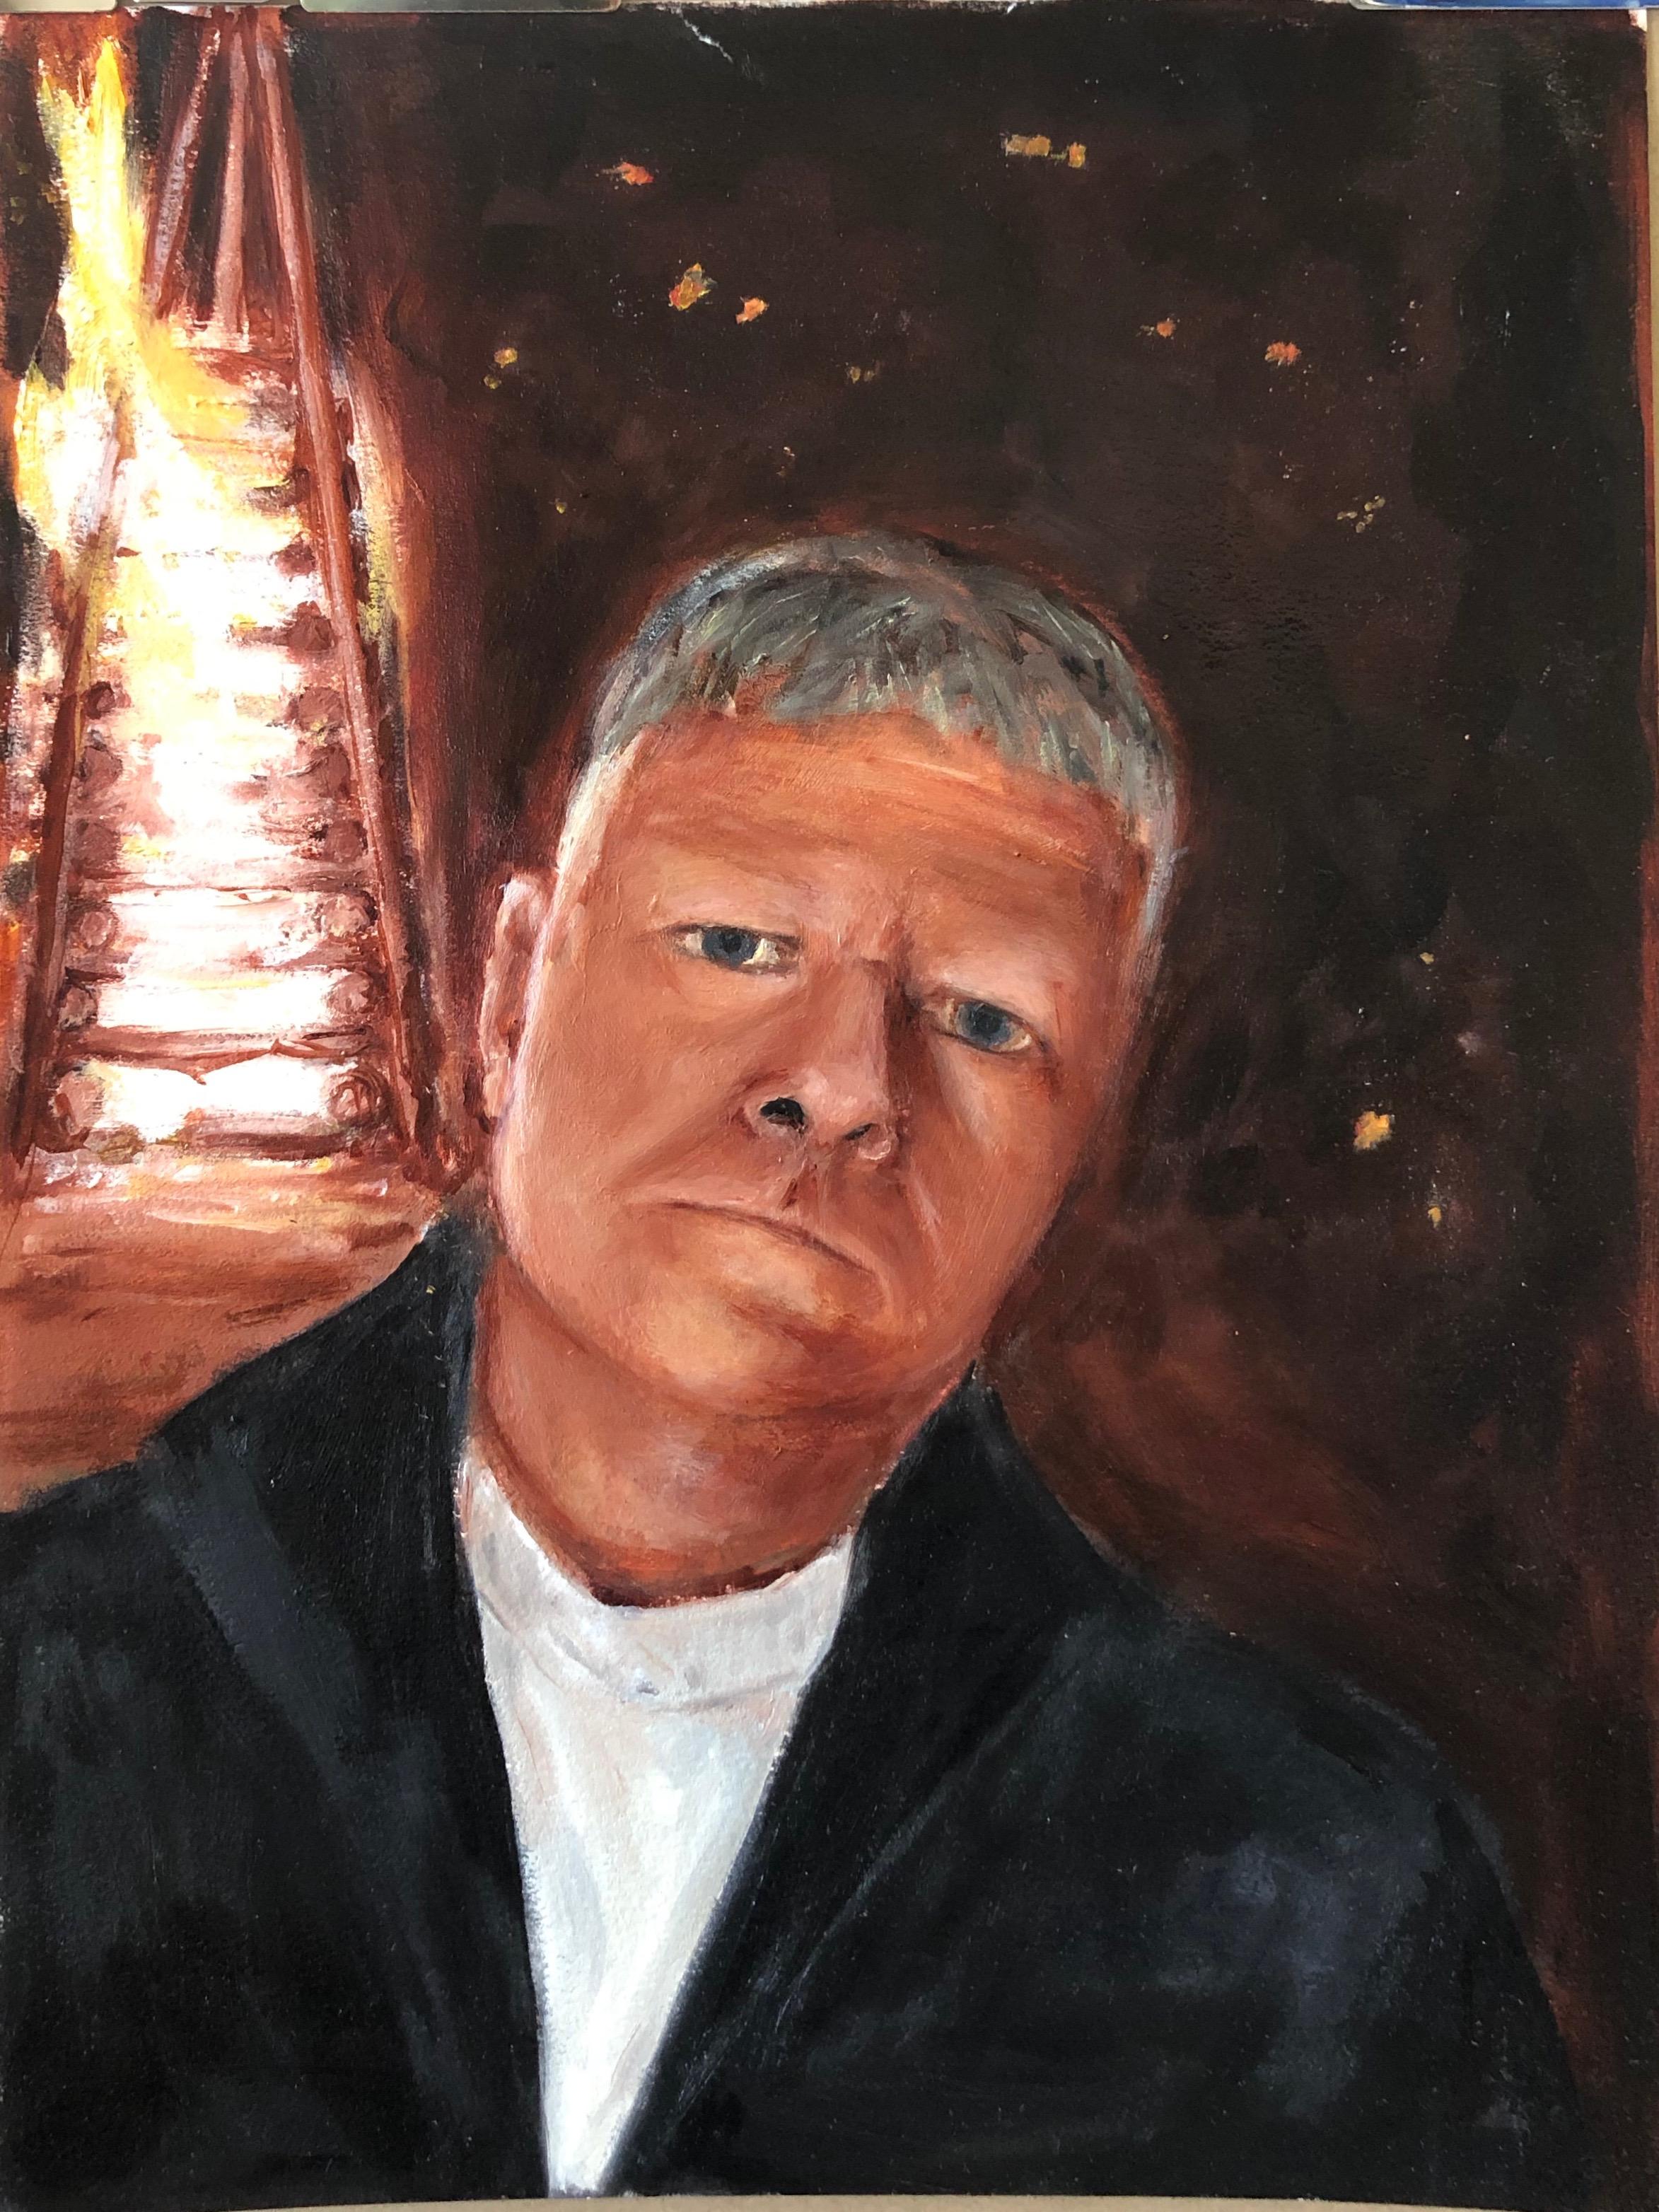 Levee Fires: Paul